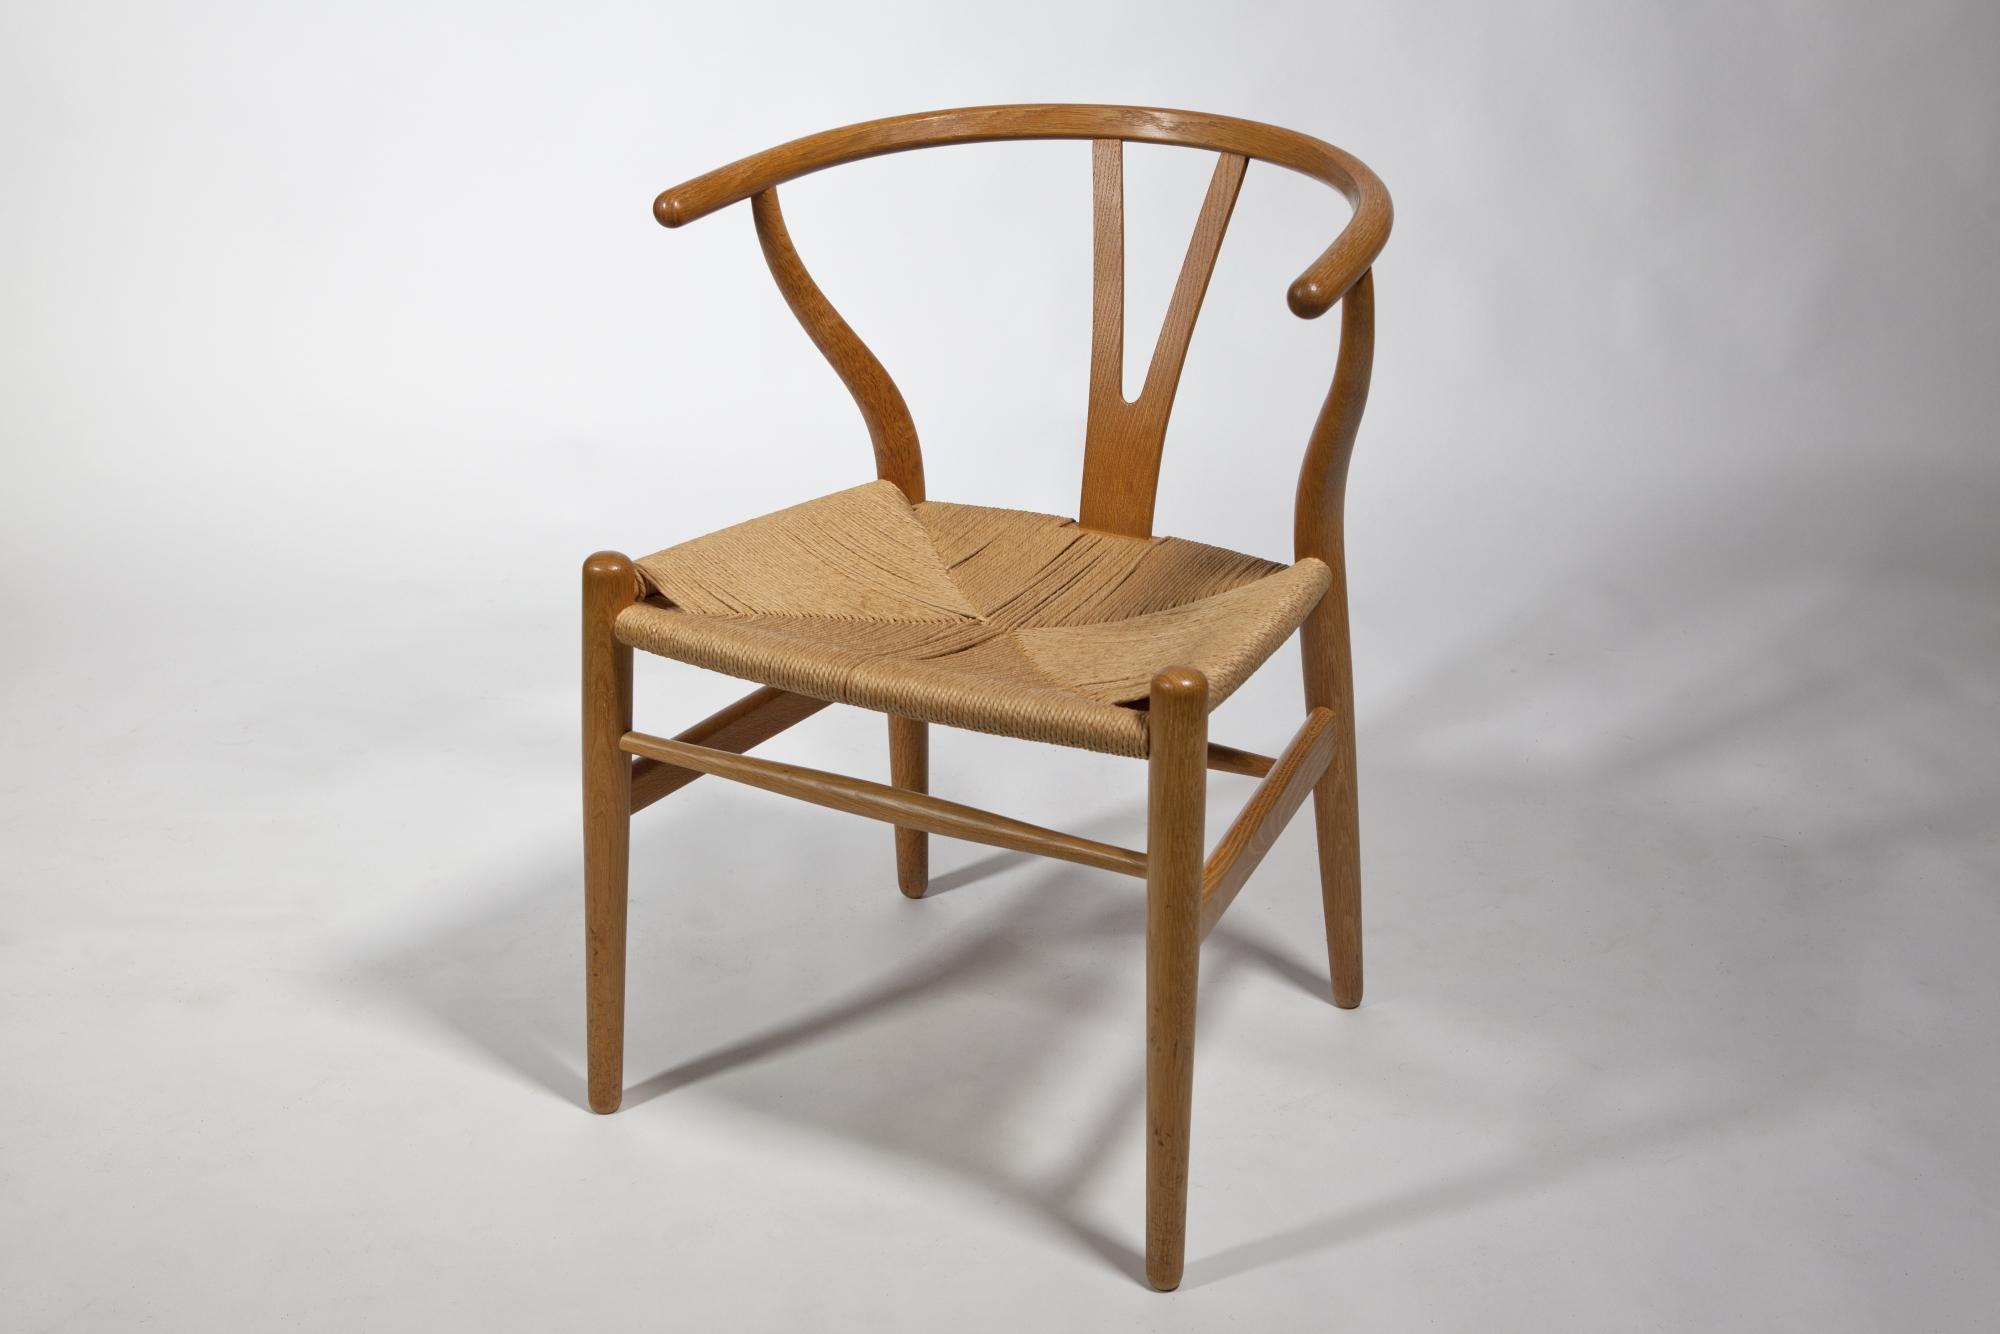 Hans Wegner Stoel : Hans wegner wishbone or y chair model ch designed carl